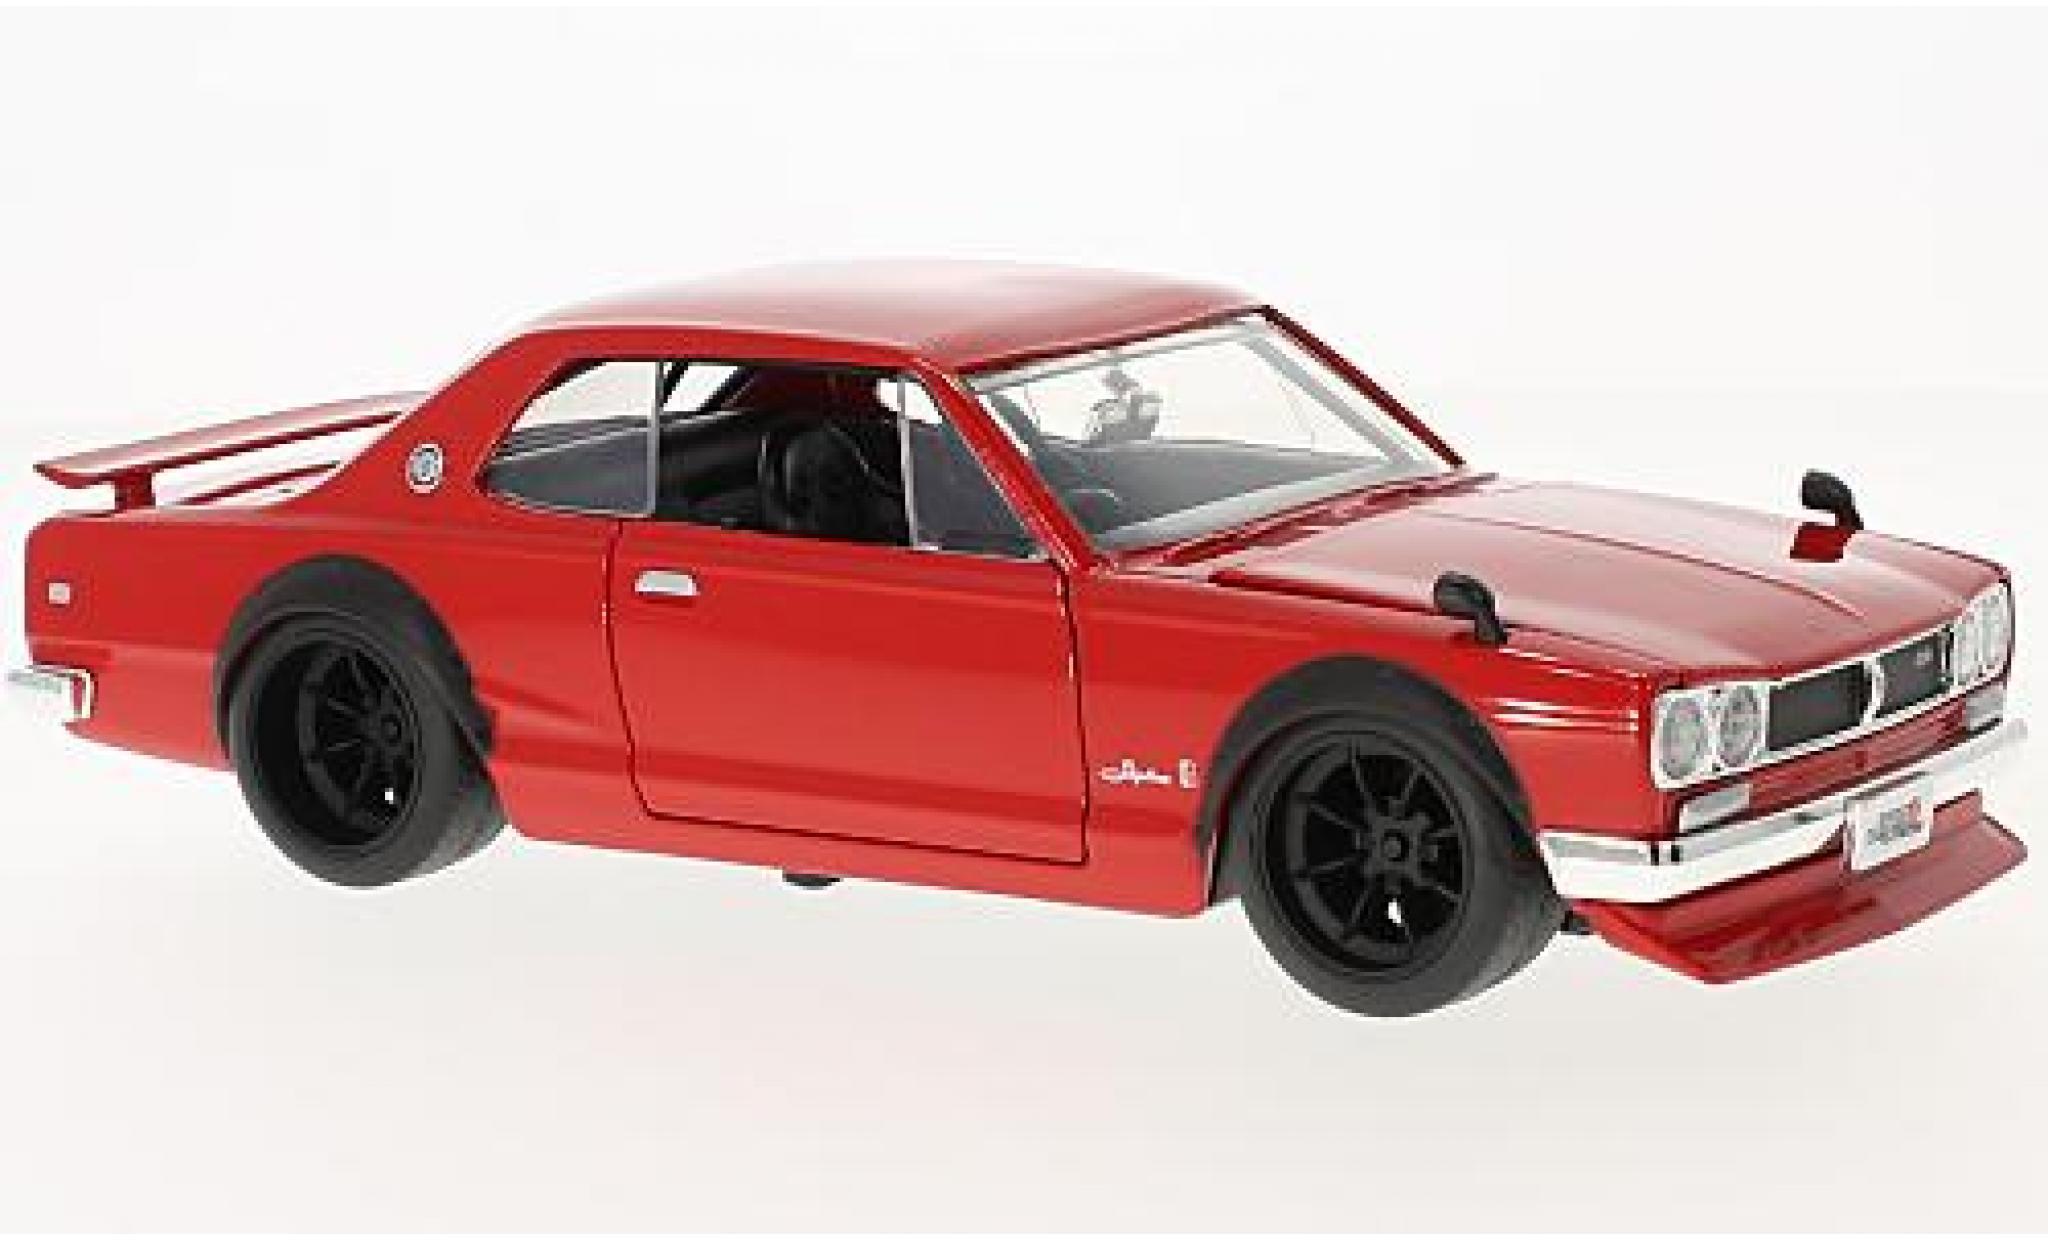 Nissan Skyline 1/24 Jada Toys 2000 GT-R (KPGC 10) rouge RHD 1971